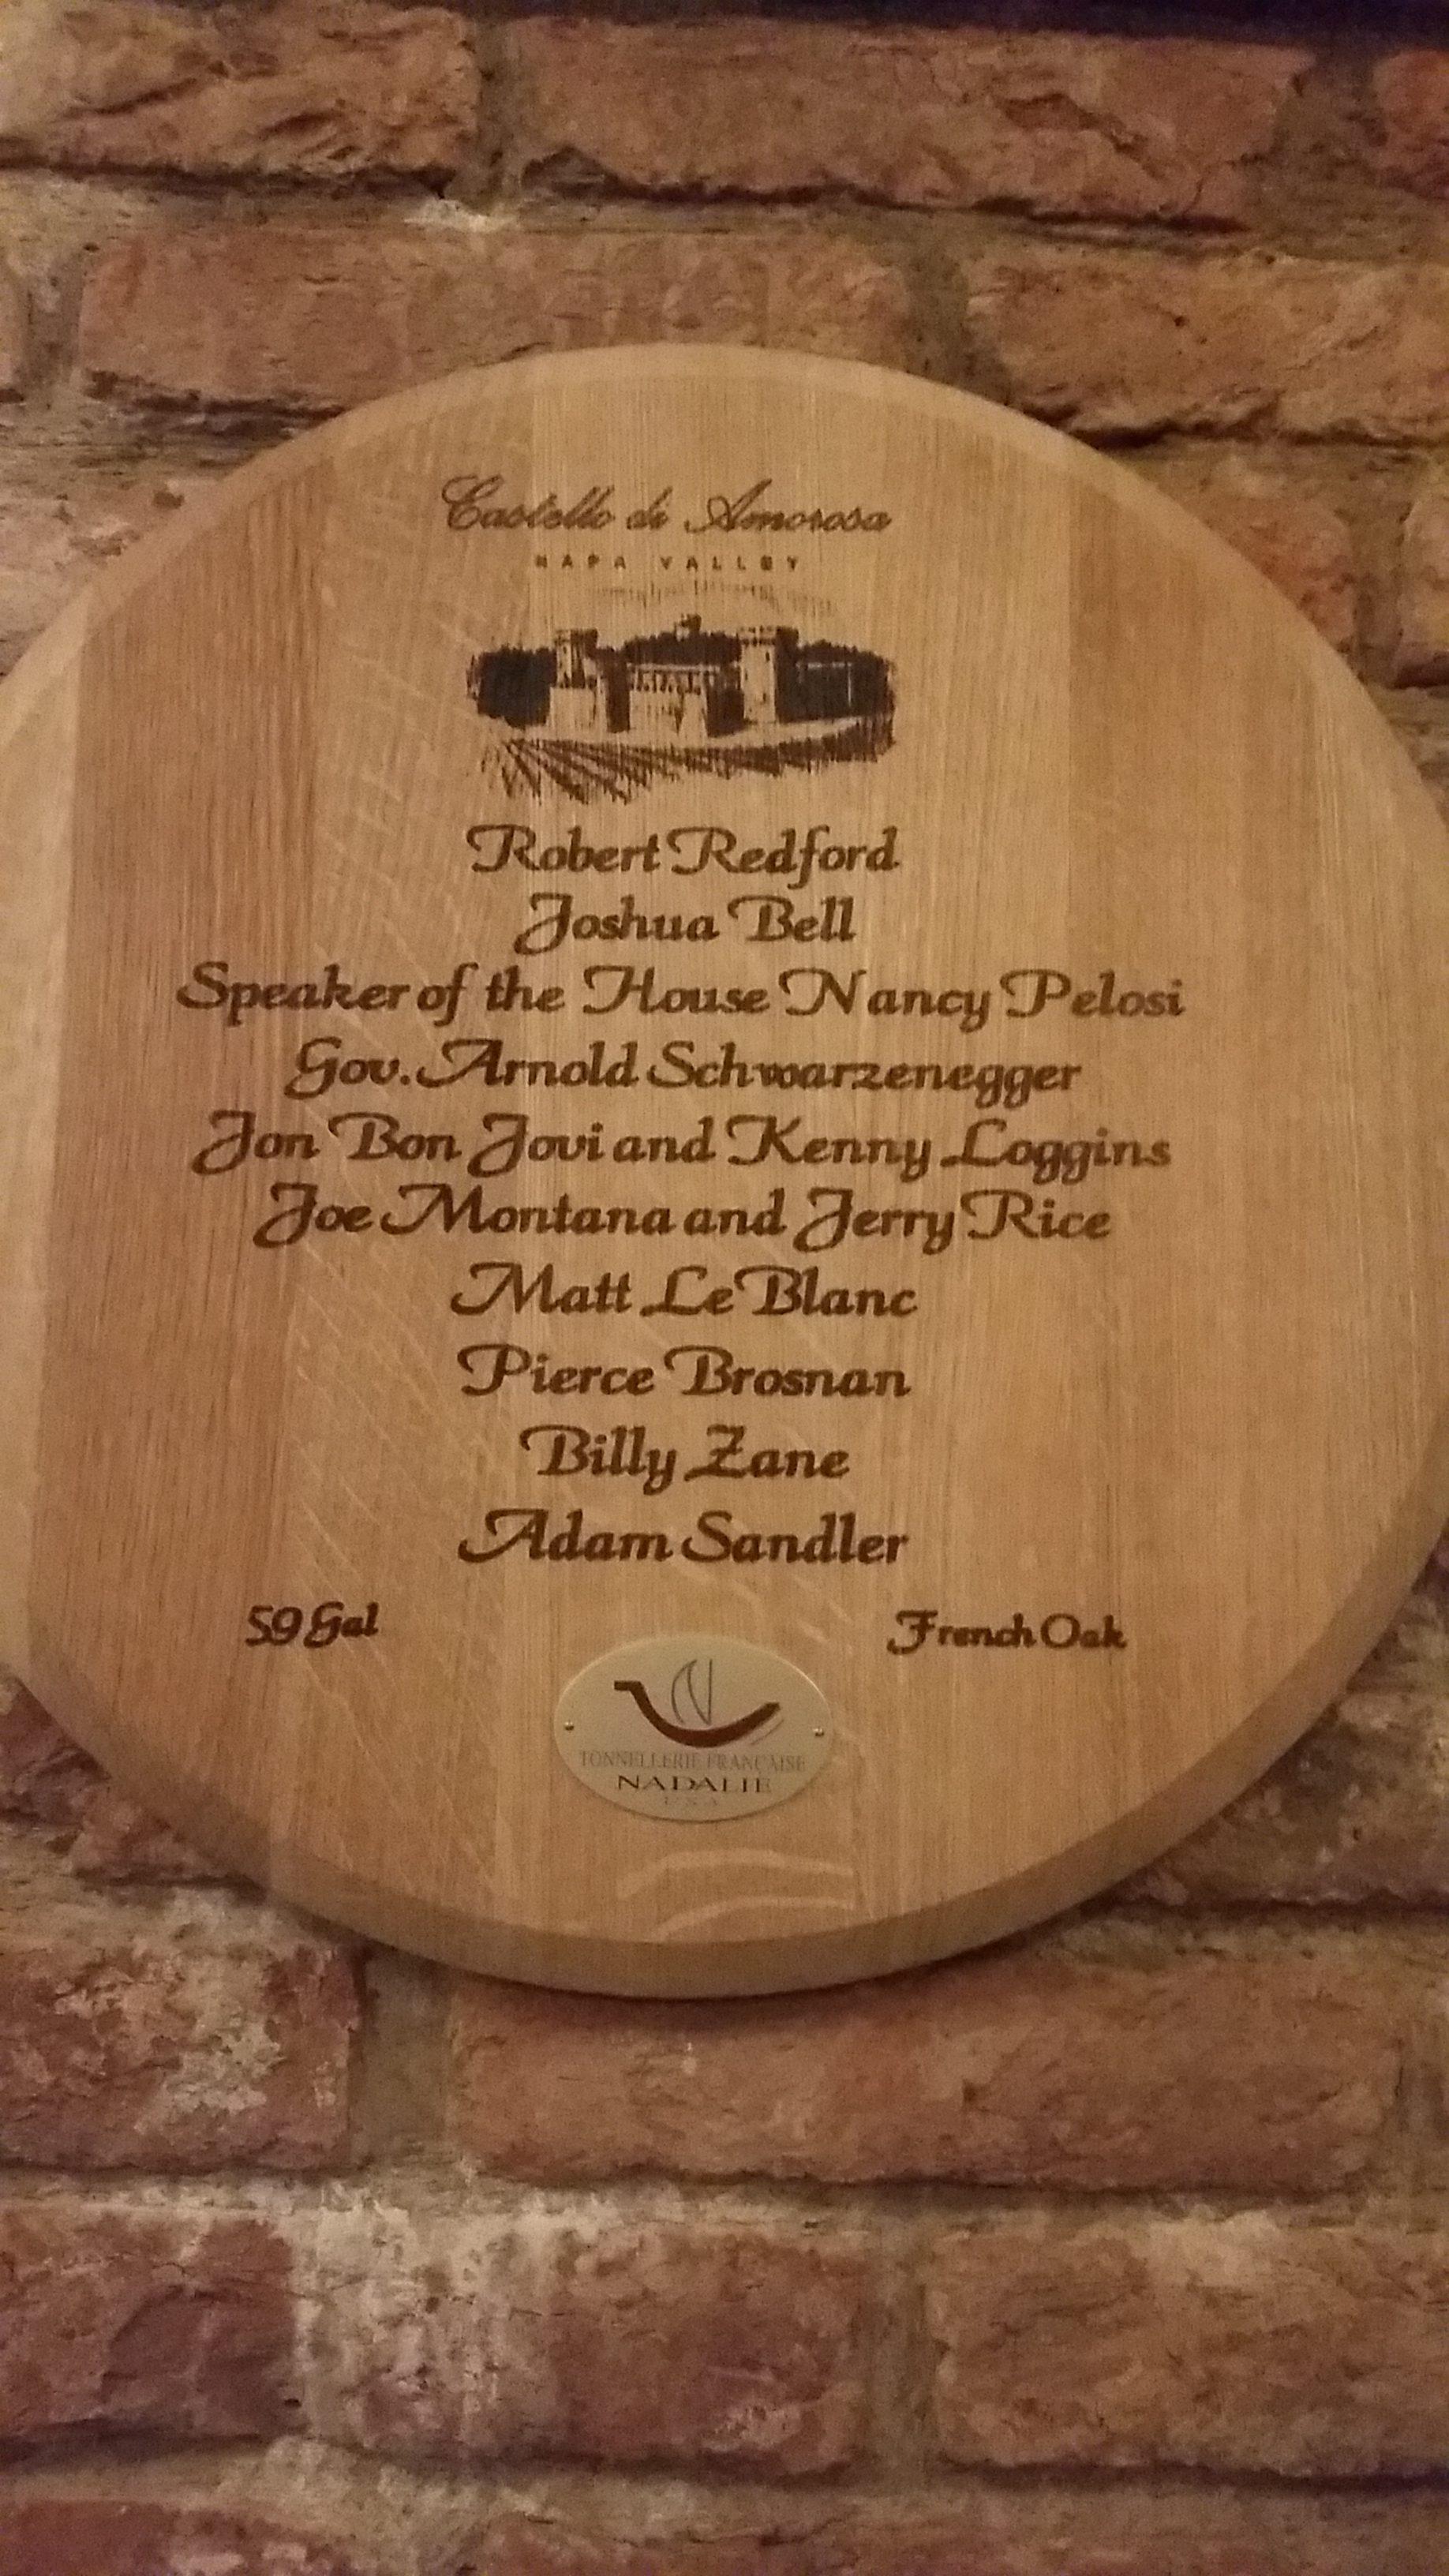 List of high profile members of the Castello di Amorosa wine club